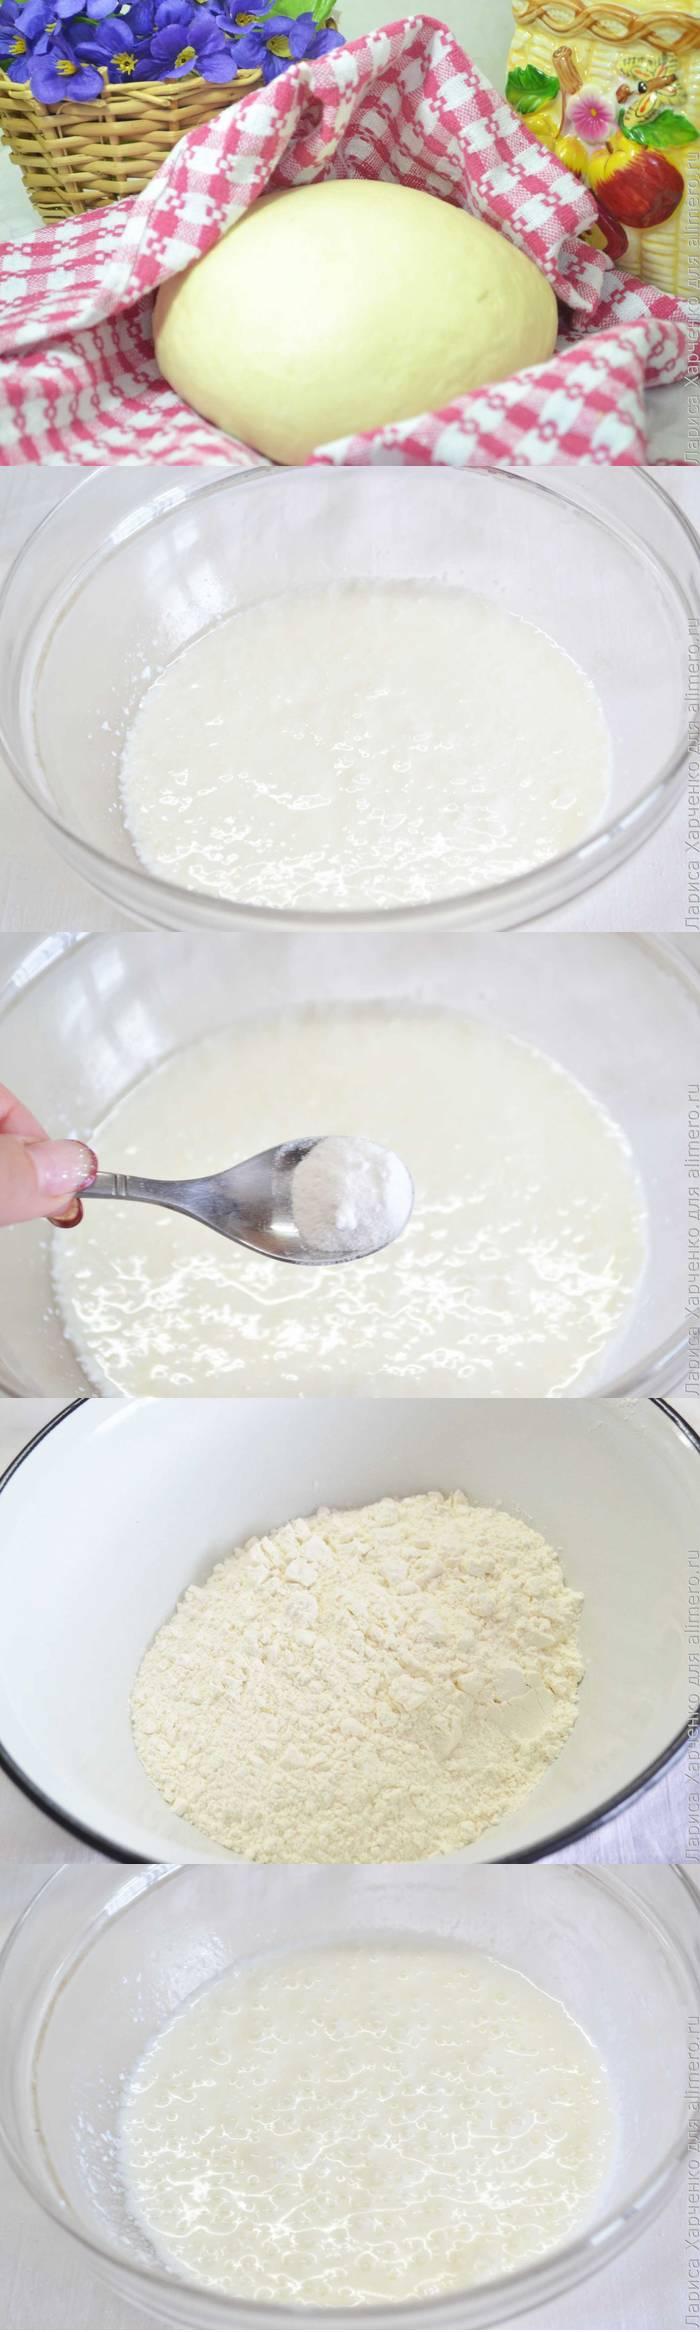 Бездрожжевое тесто на кефире для пирожков